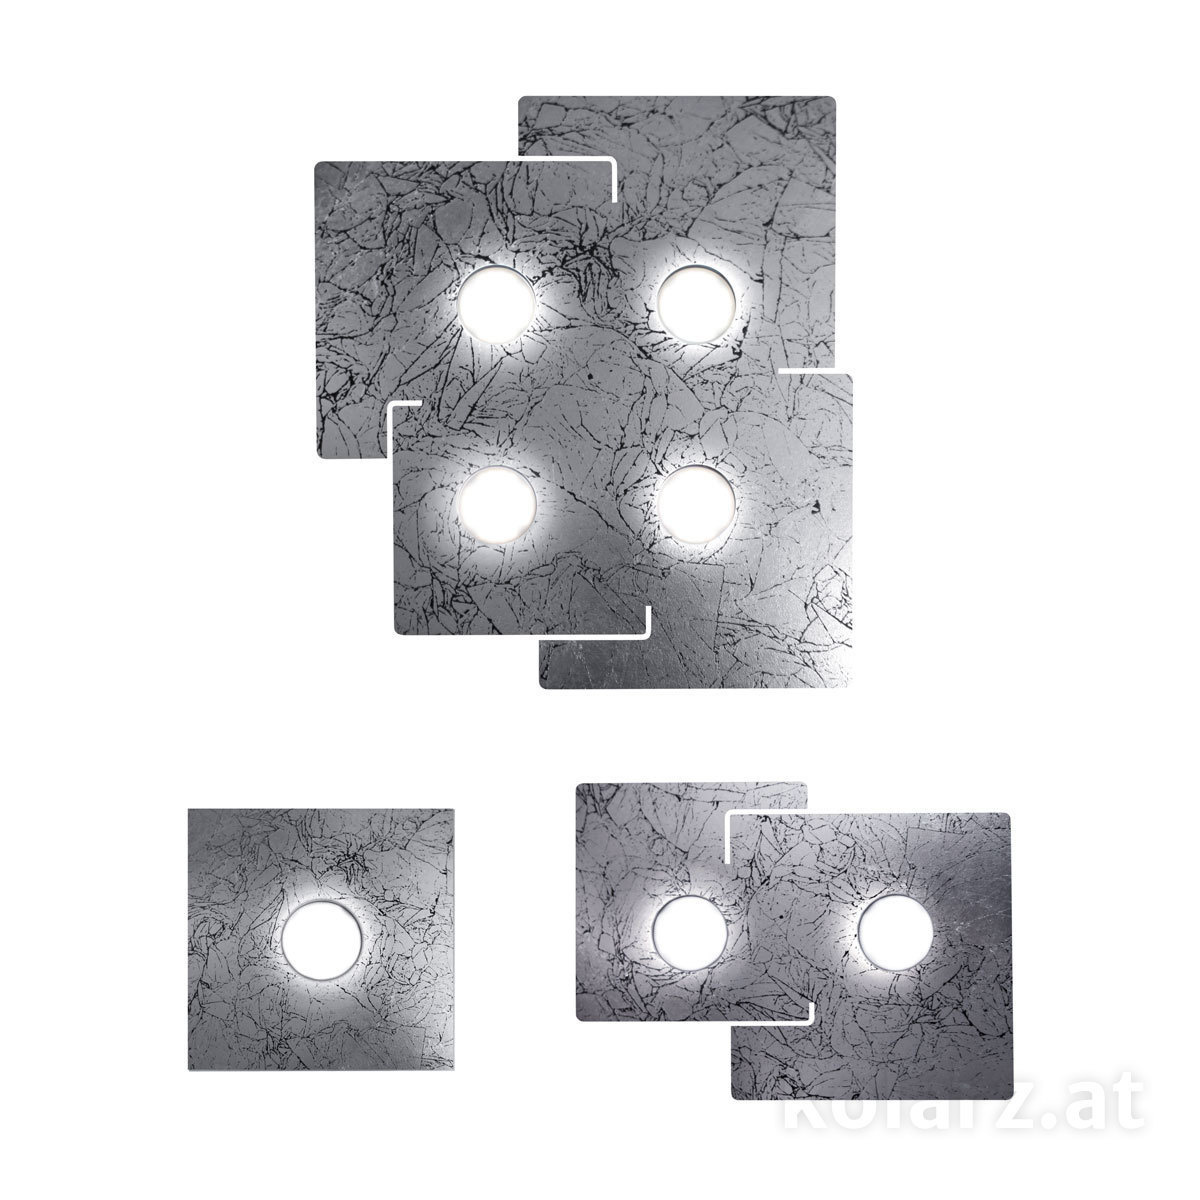 A1337-14-1-VinAg-f2.jpg